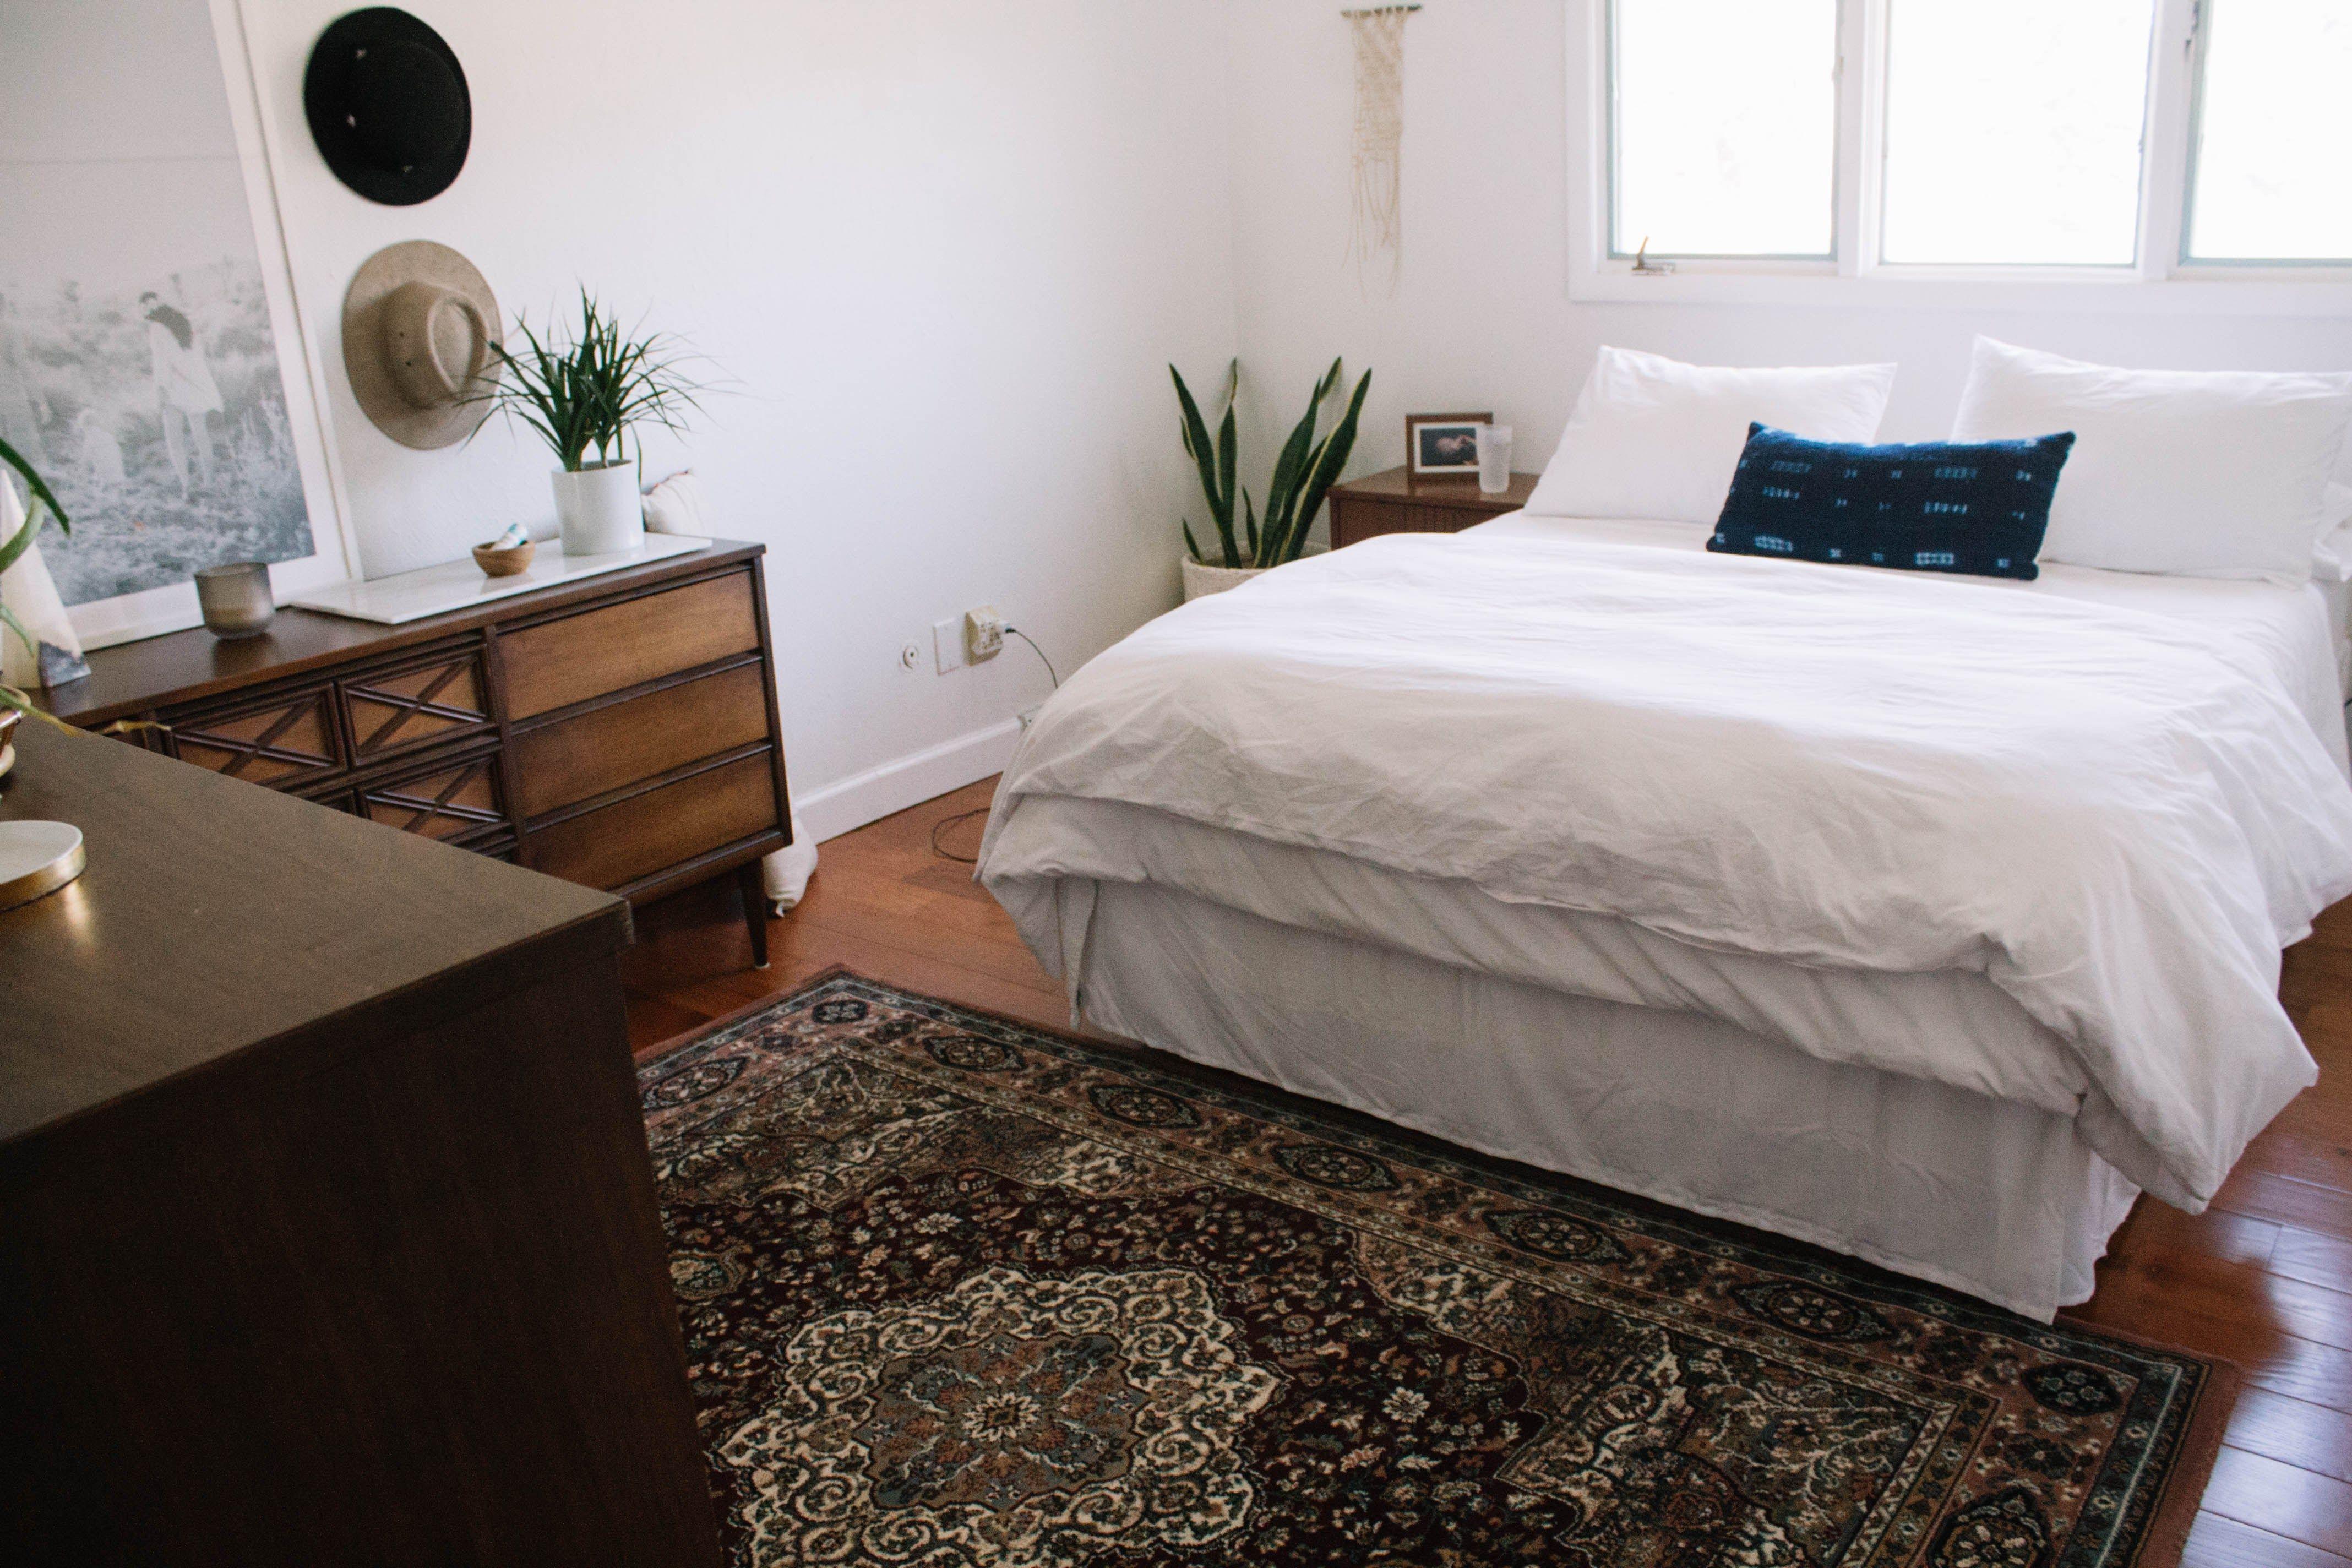 Boho bedroom with Little Rug Shop rug (With images) Boho